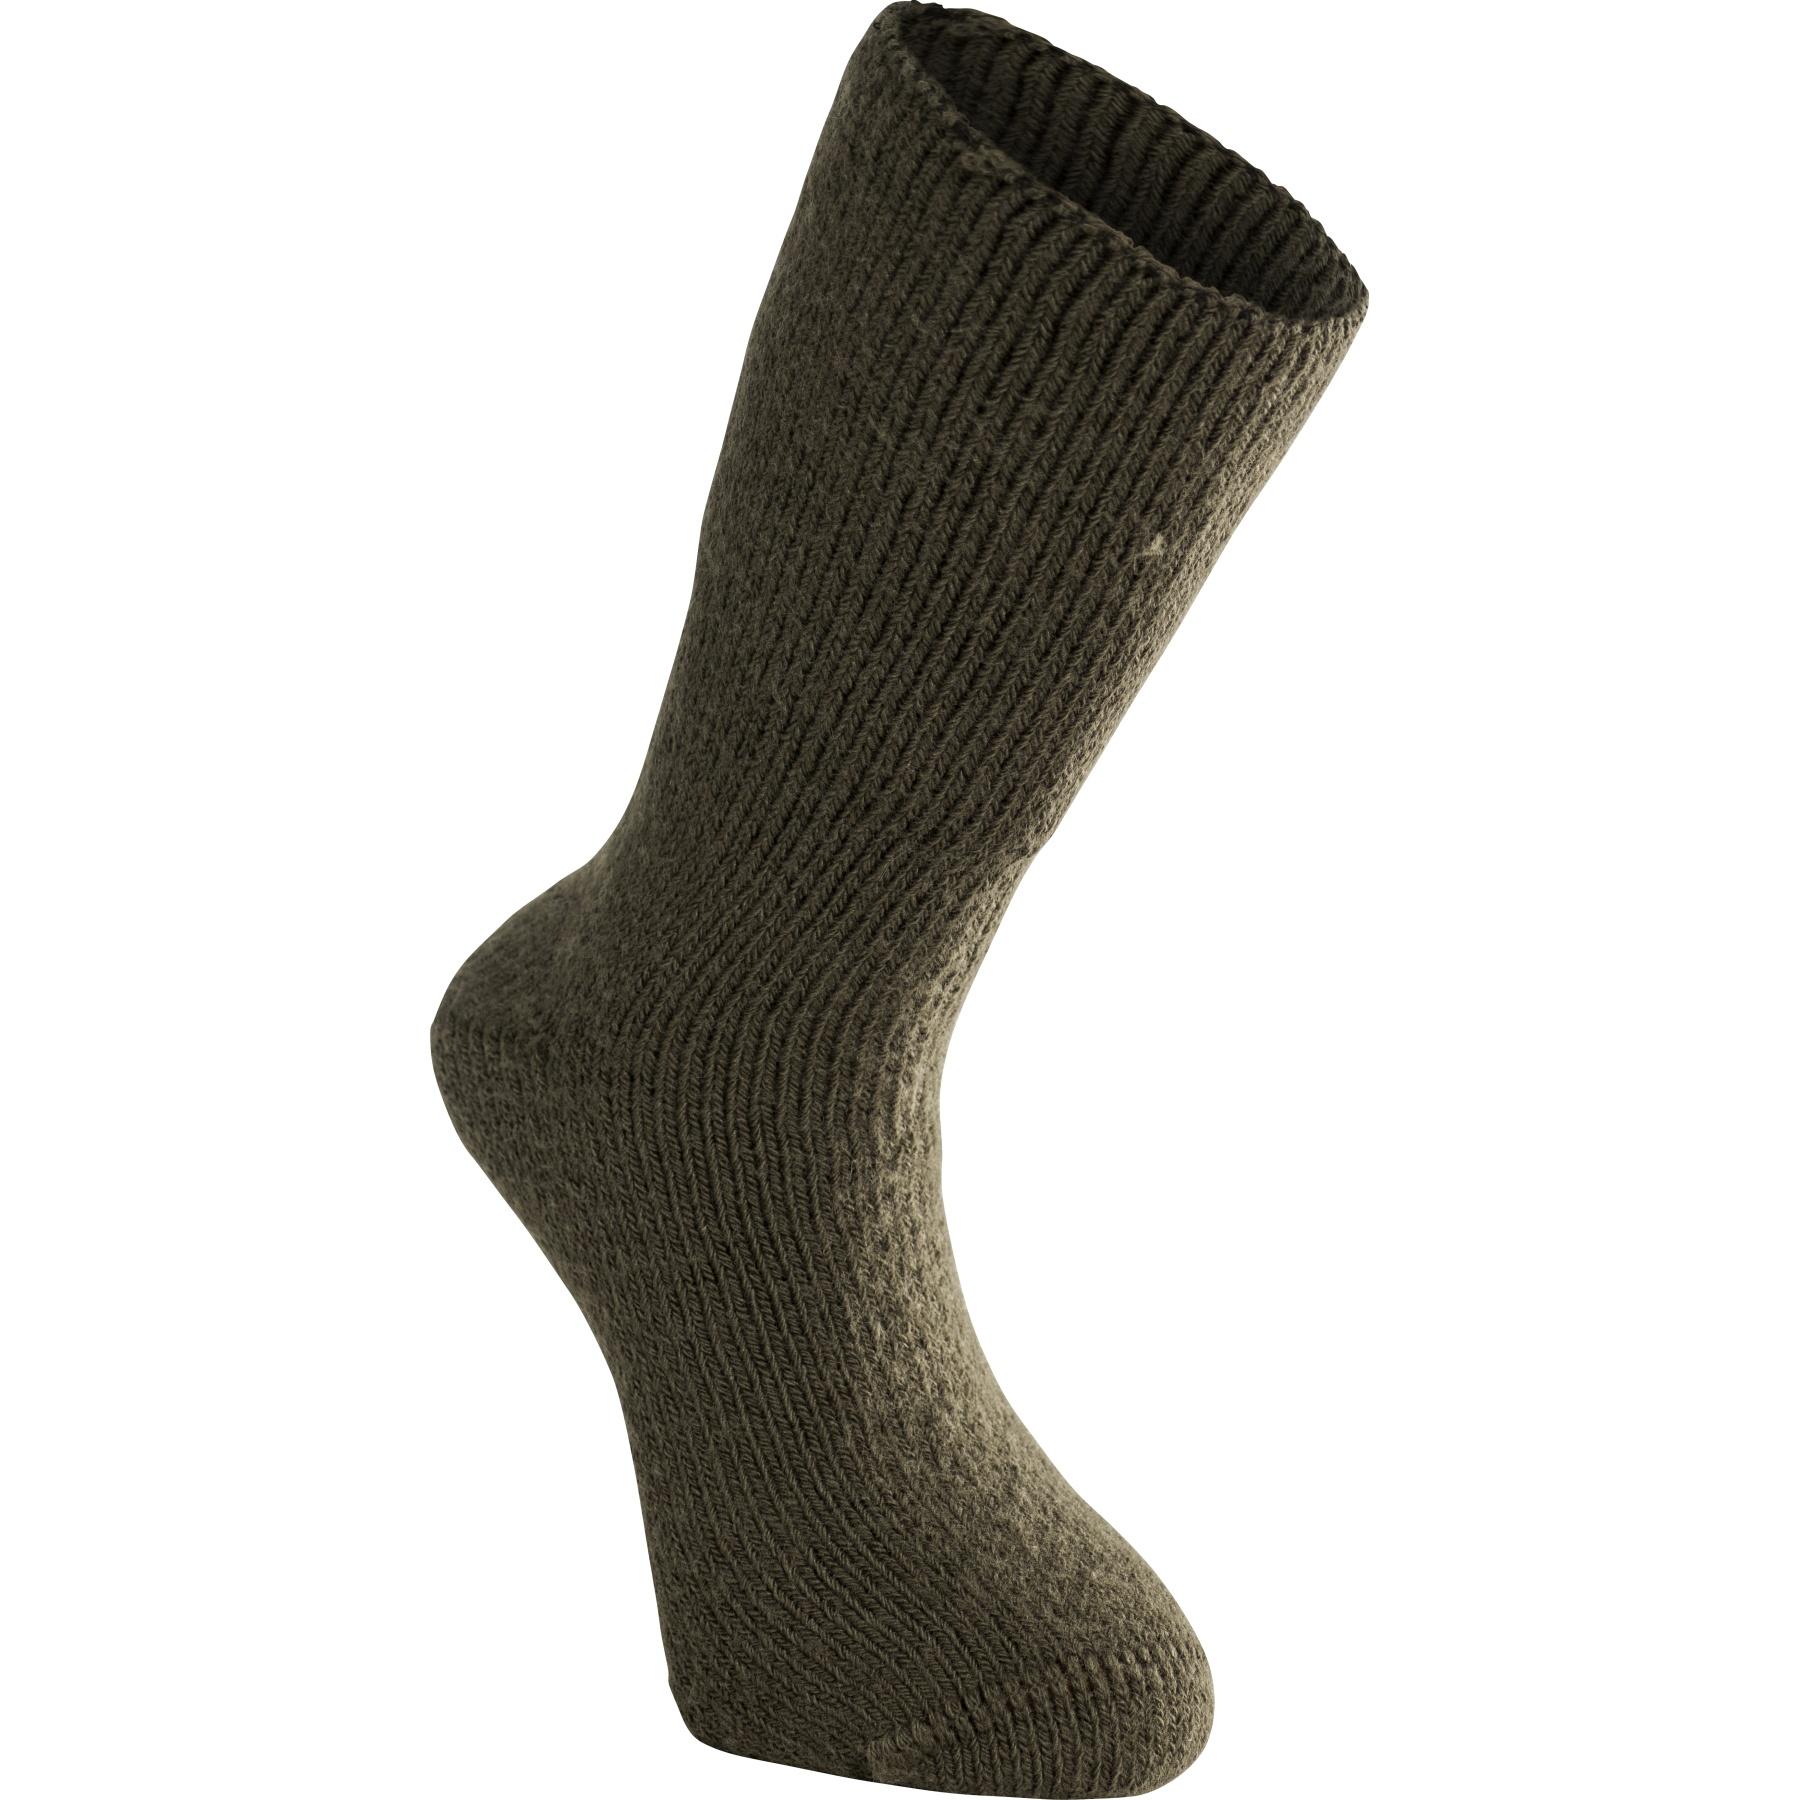 Woolpower Classic 600 Socken - pine green